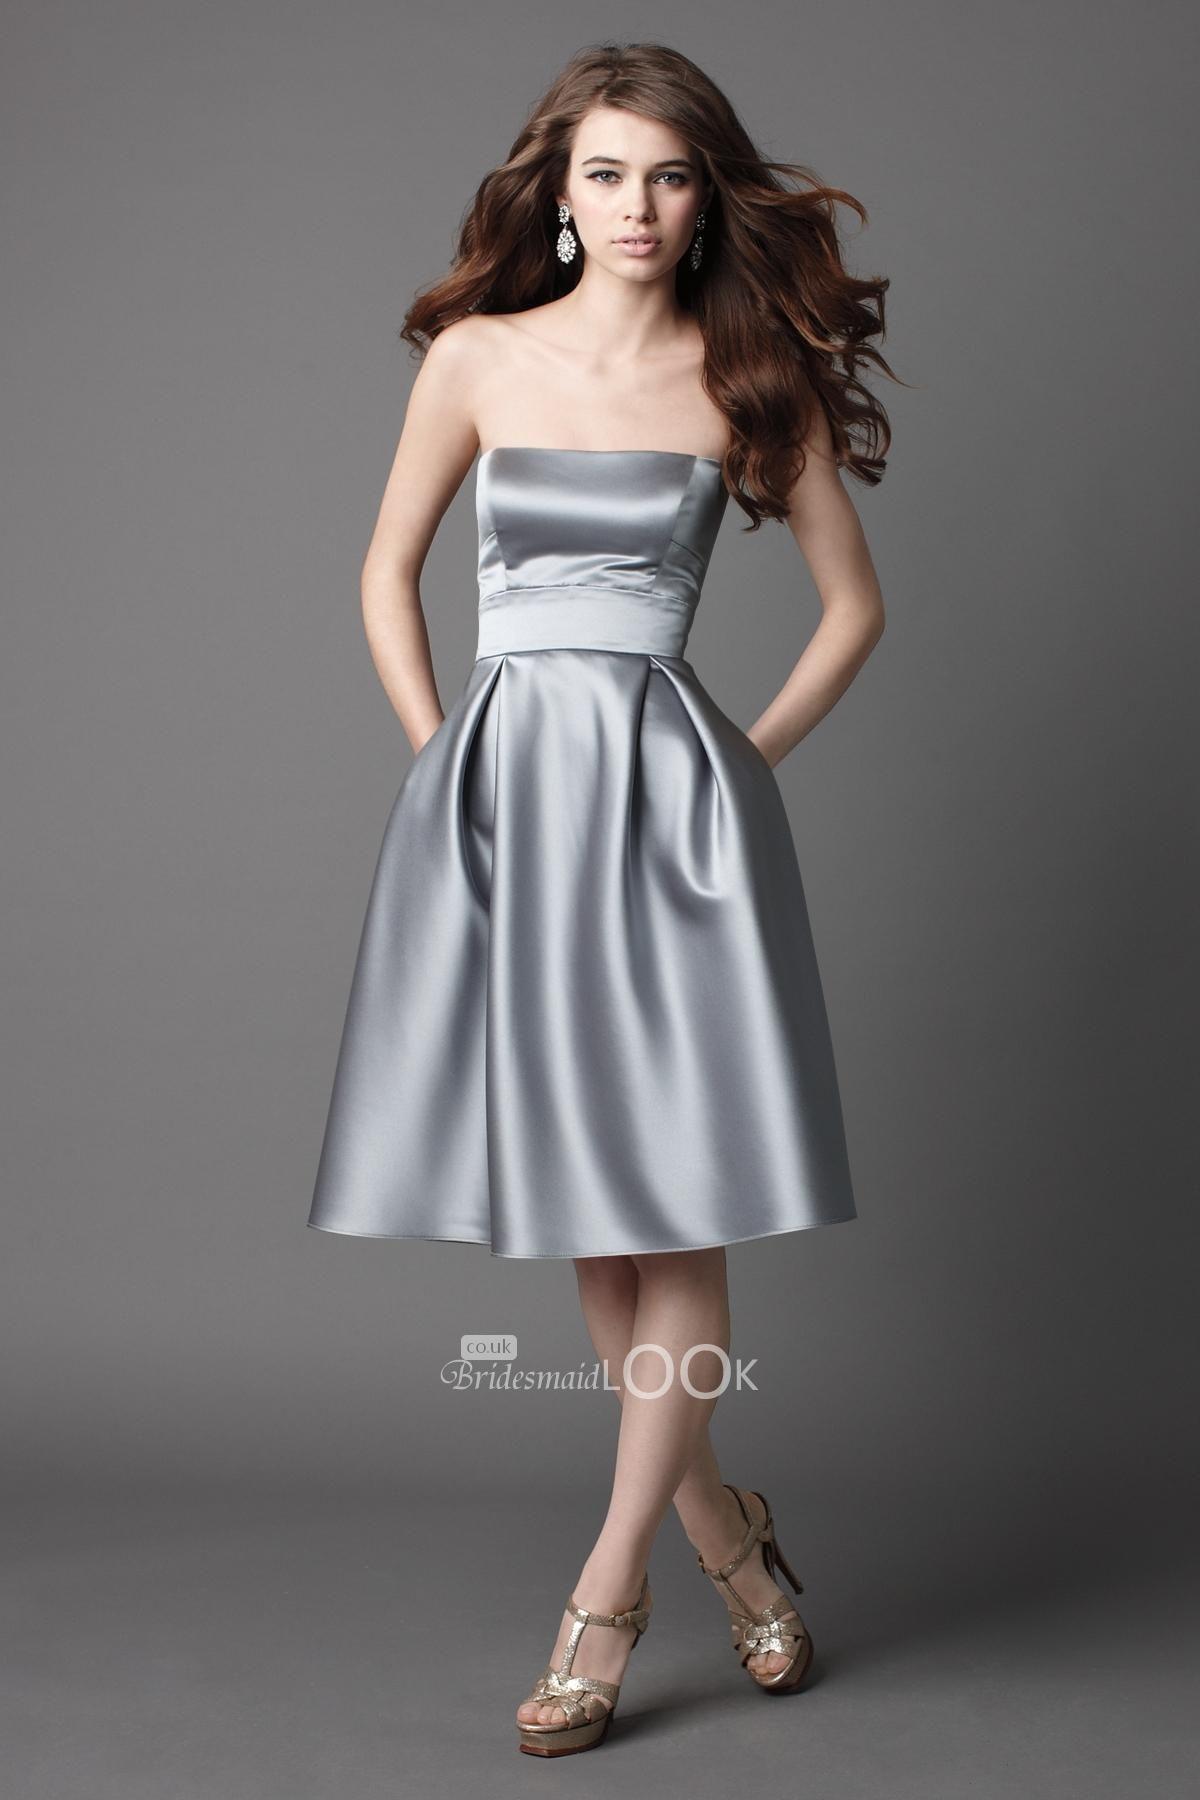 Strapless Bridesmaid Dresses Under 100